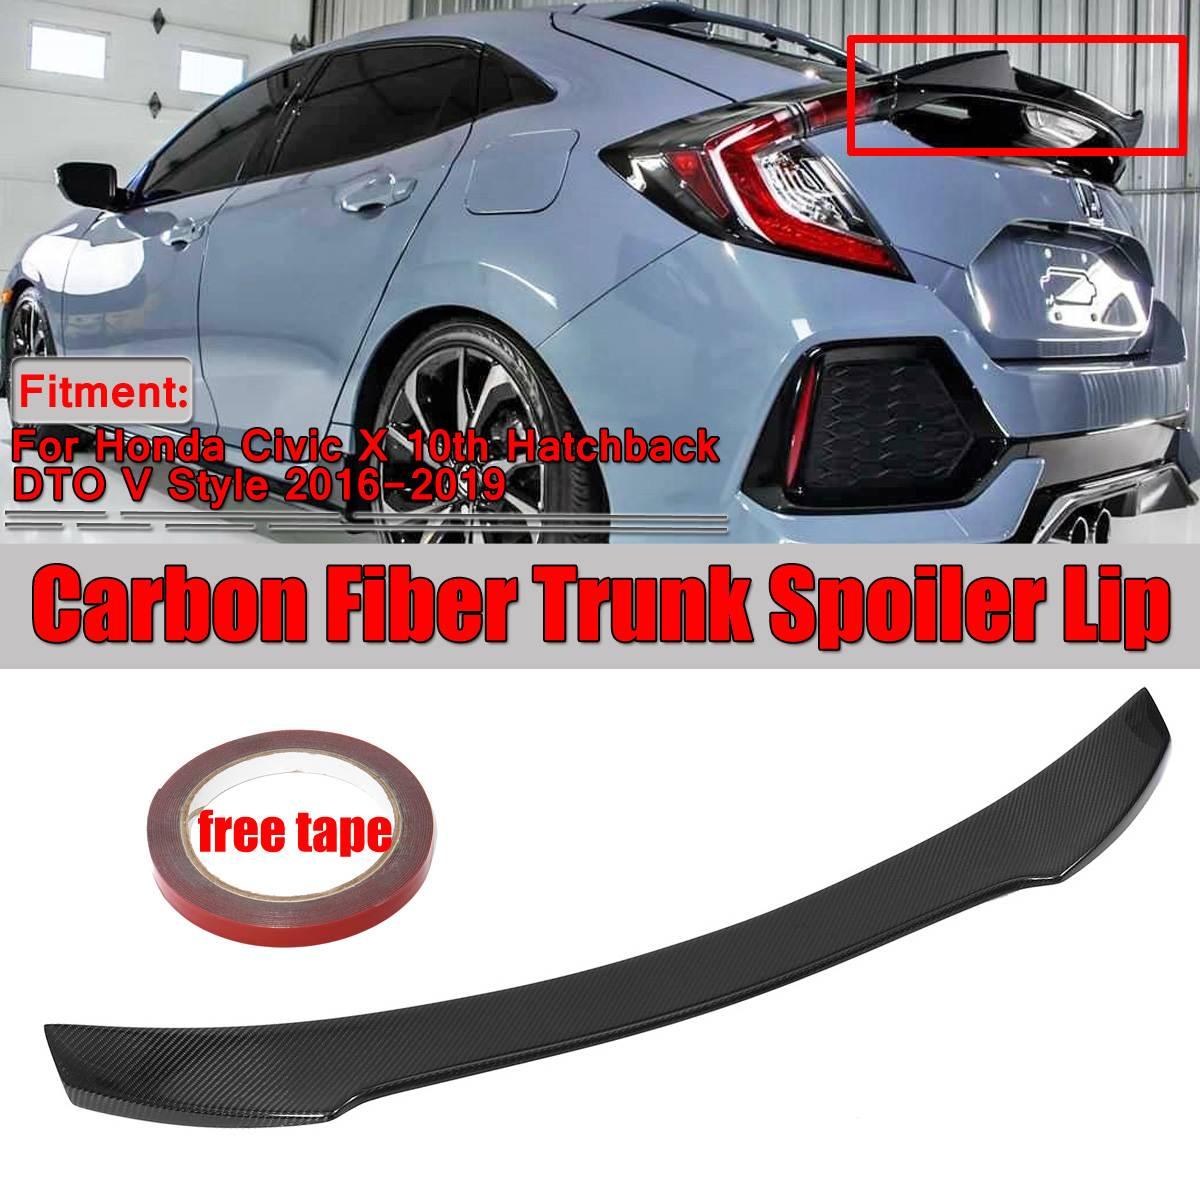 1xReal karbon Fiber araç gövde arka çatı spoileri kanat dudak Honda Civic X 10th Hatchback DTO V tarzı 2016 -2019 kanat spoiler